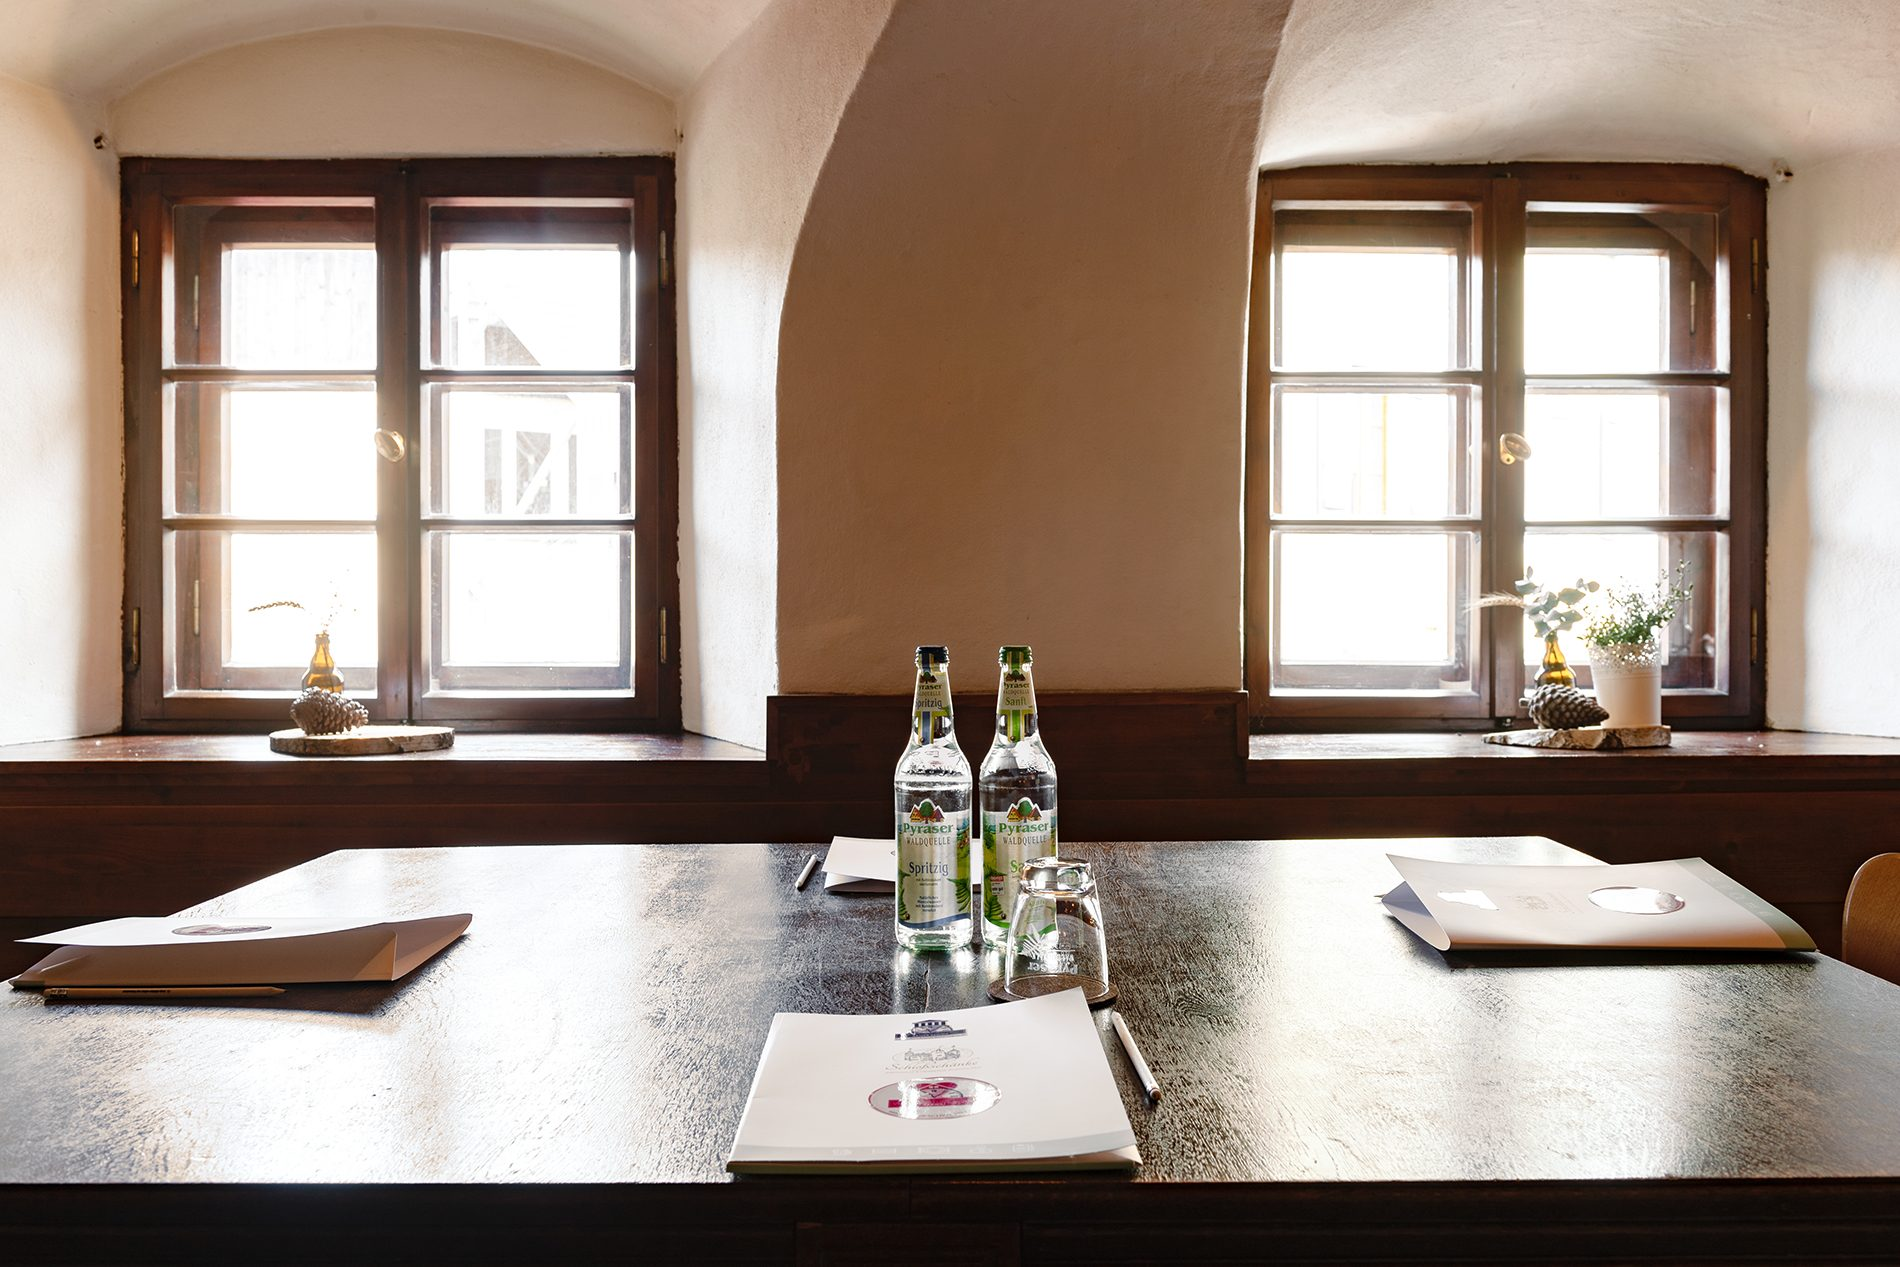 Schloss_Eysoelden_052021_8982